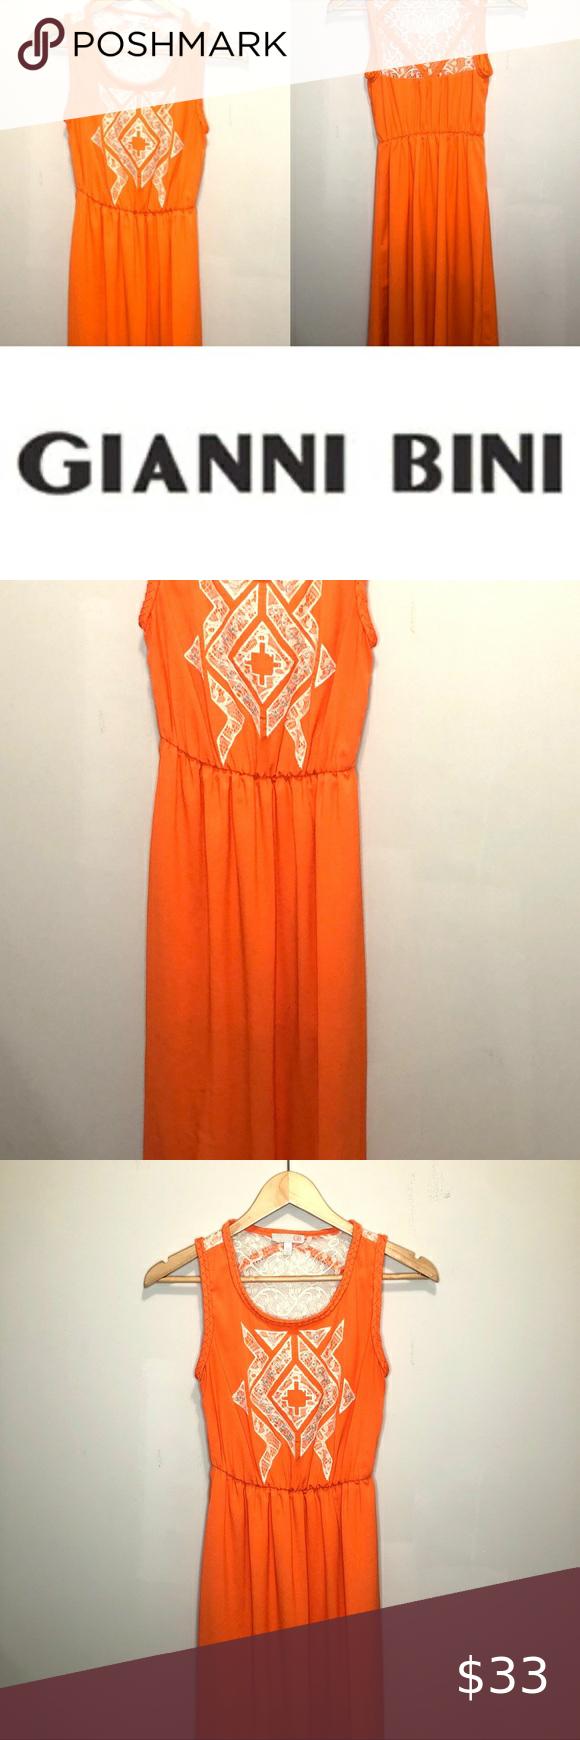 Gb Gianna Bini Maxi Long Festival Dress Lace Boho In 2020 Festival Dress Lace Dress Long Maxi Dress